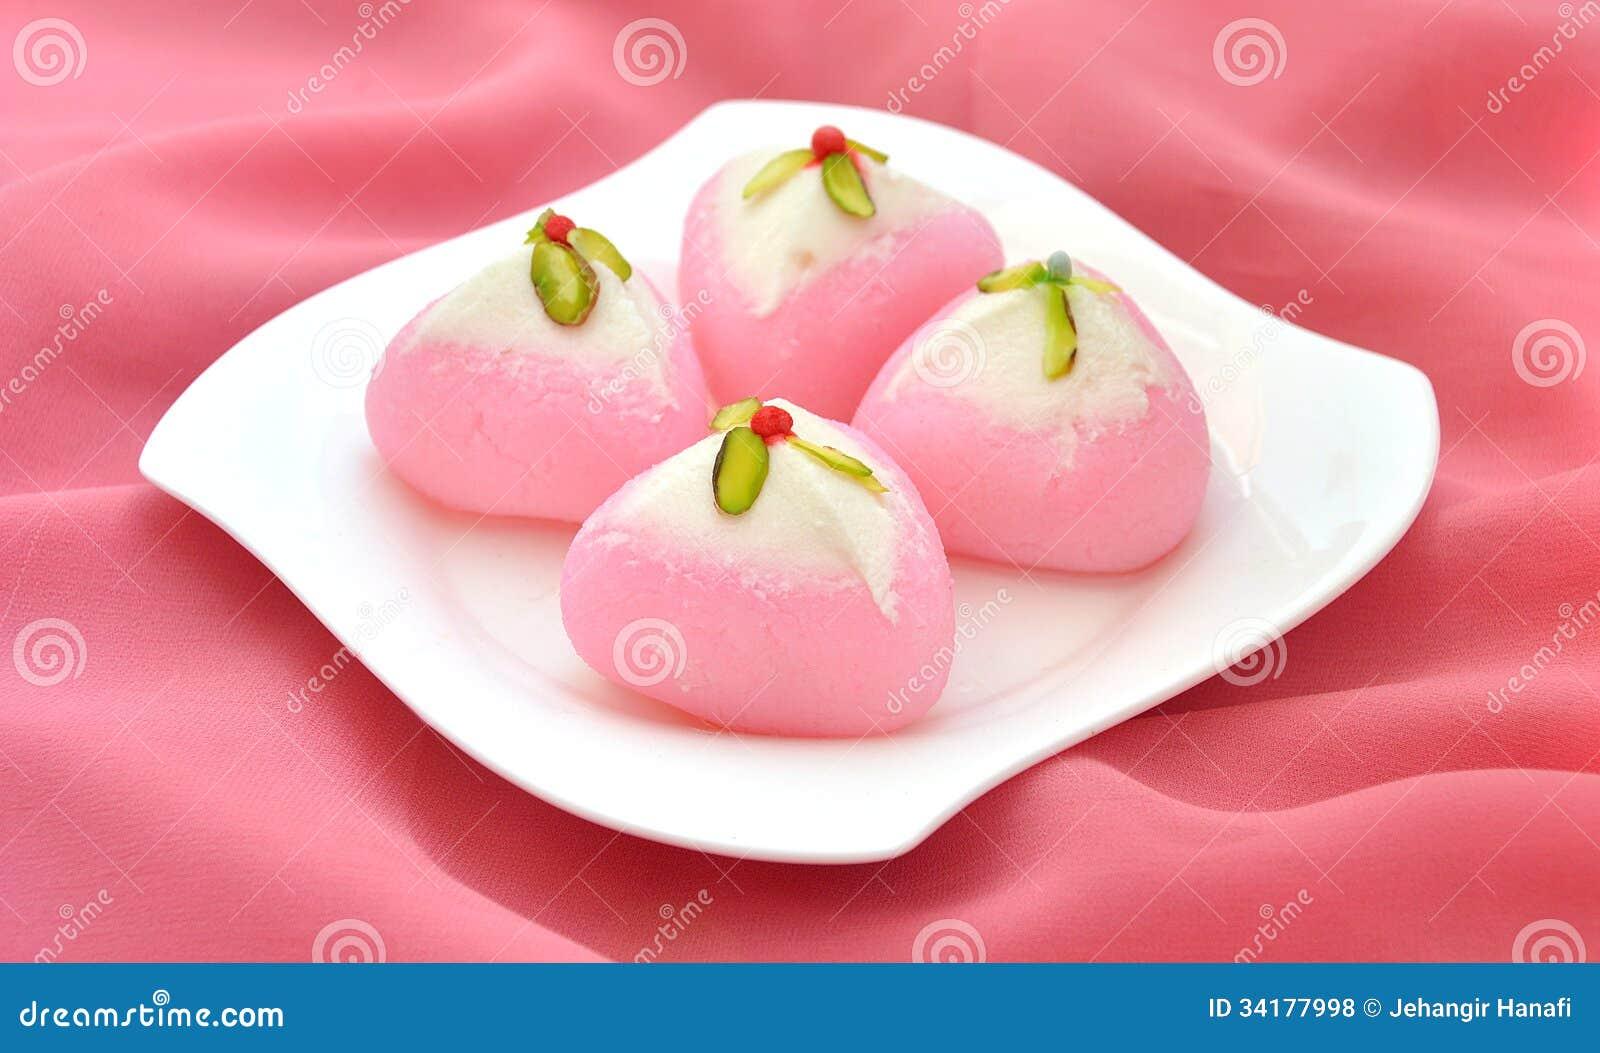 Rose Chum Chum 3 Royalty Free Stock Photos Image 34177998